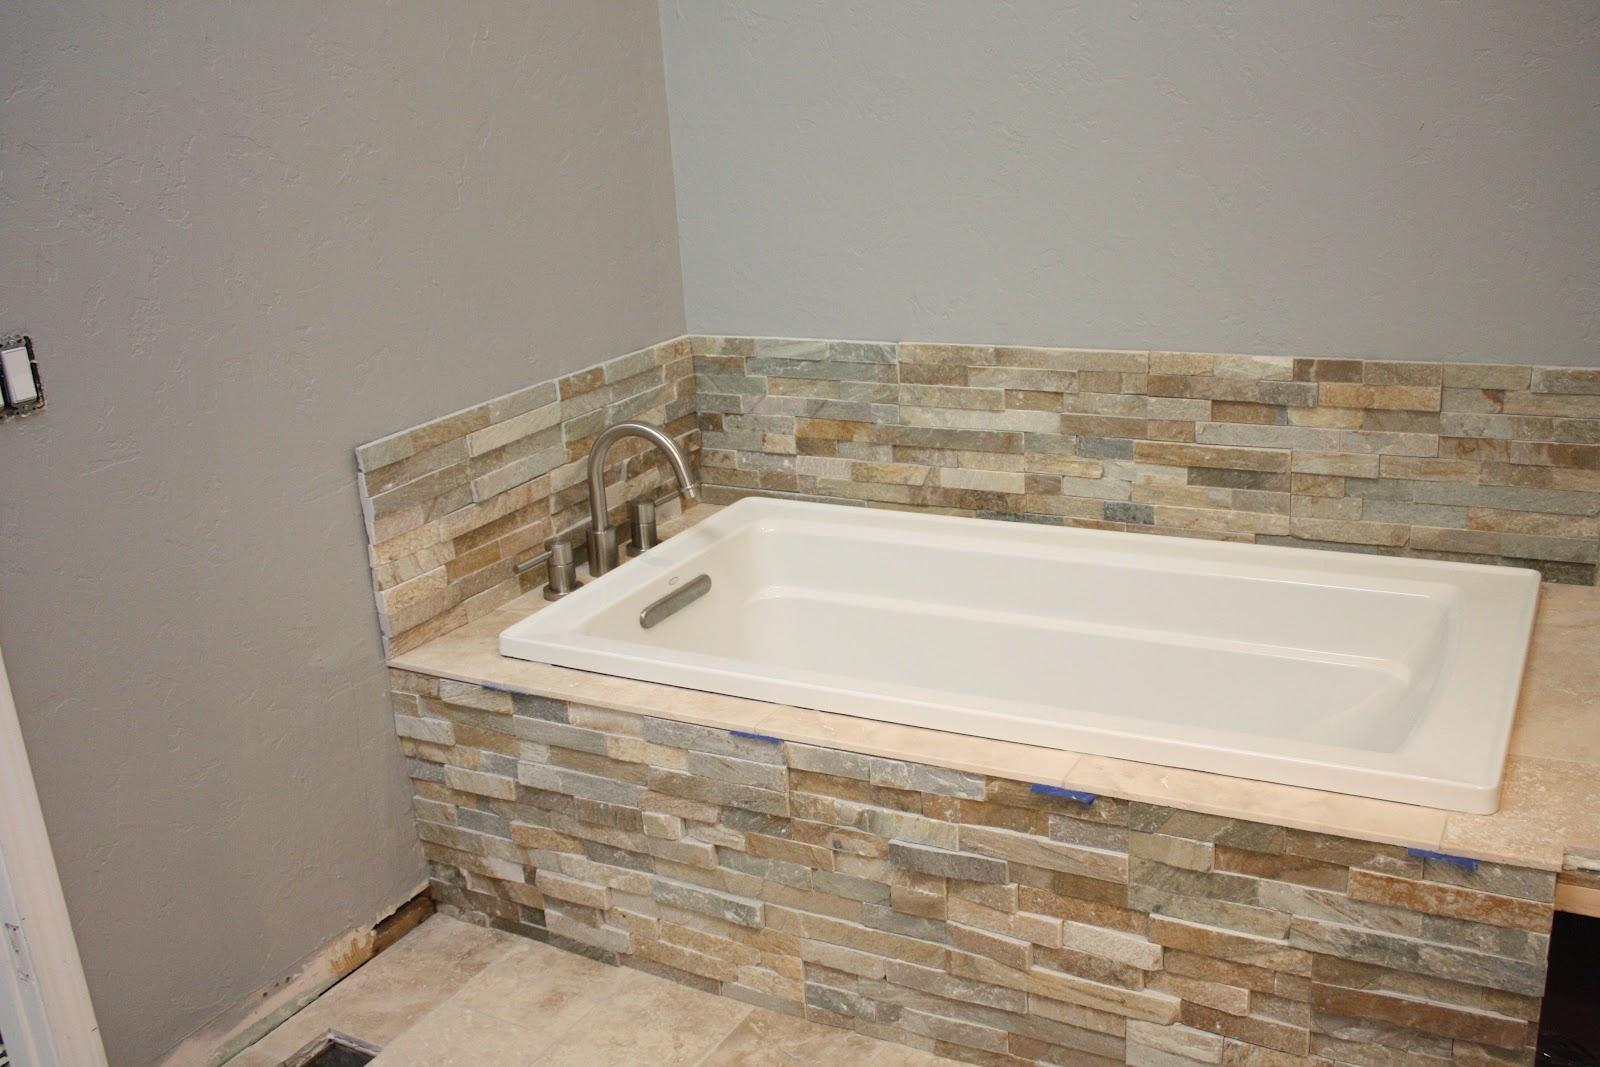 Kohler Bathtubs And Surrounds Home Improvement